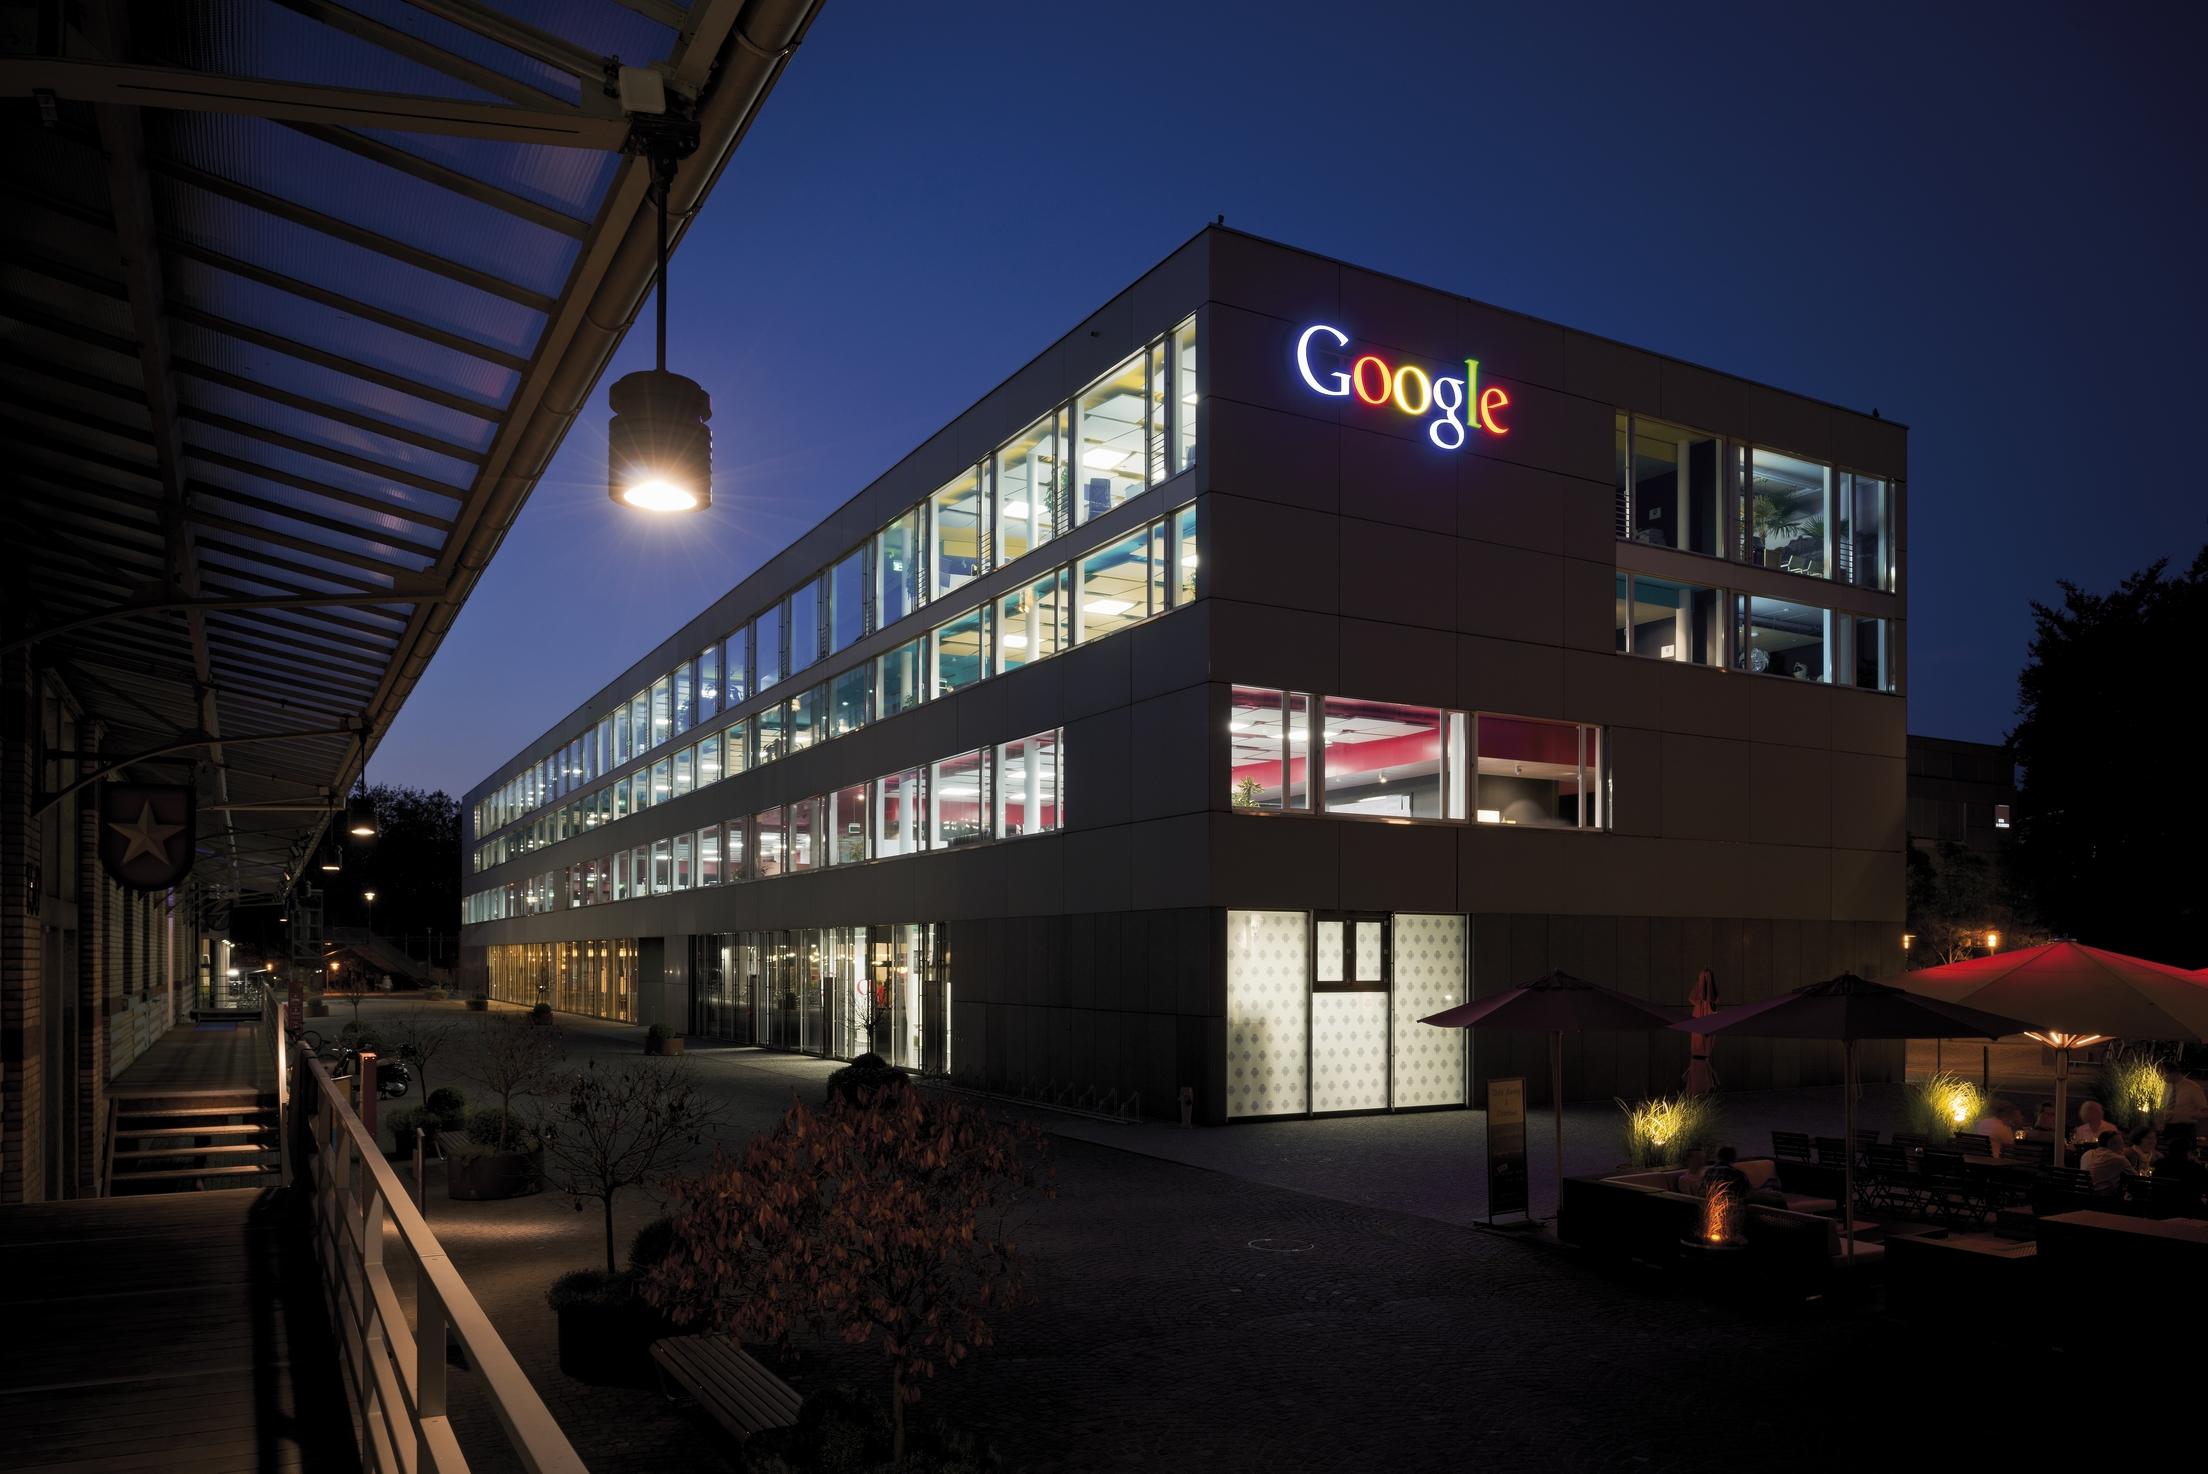 Building with the Google logo illuminated at night.